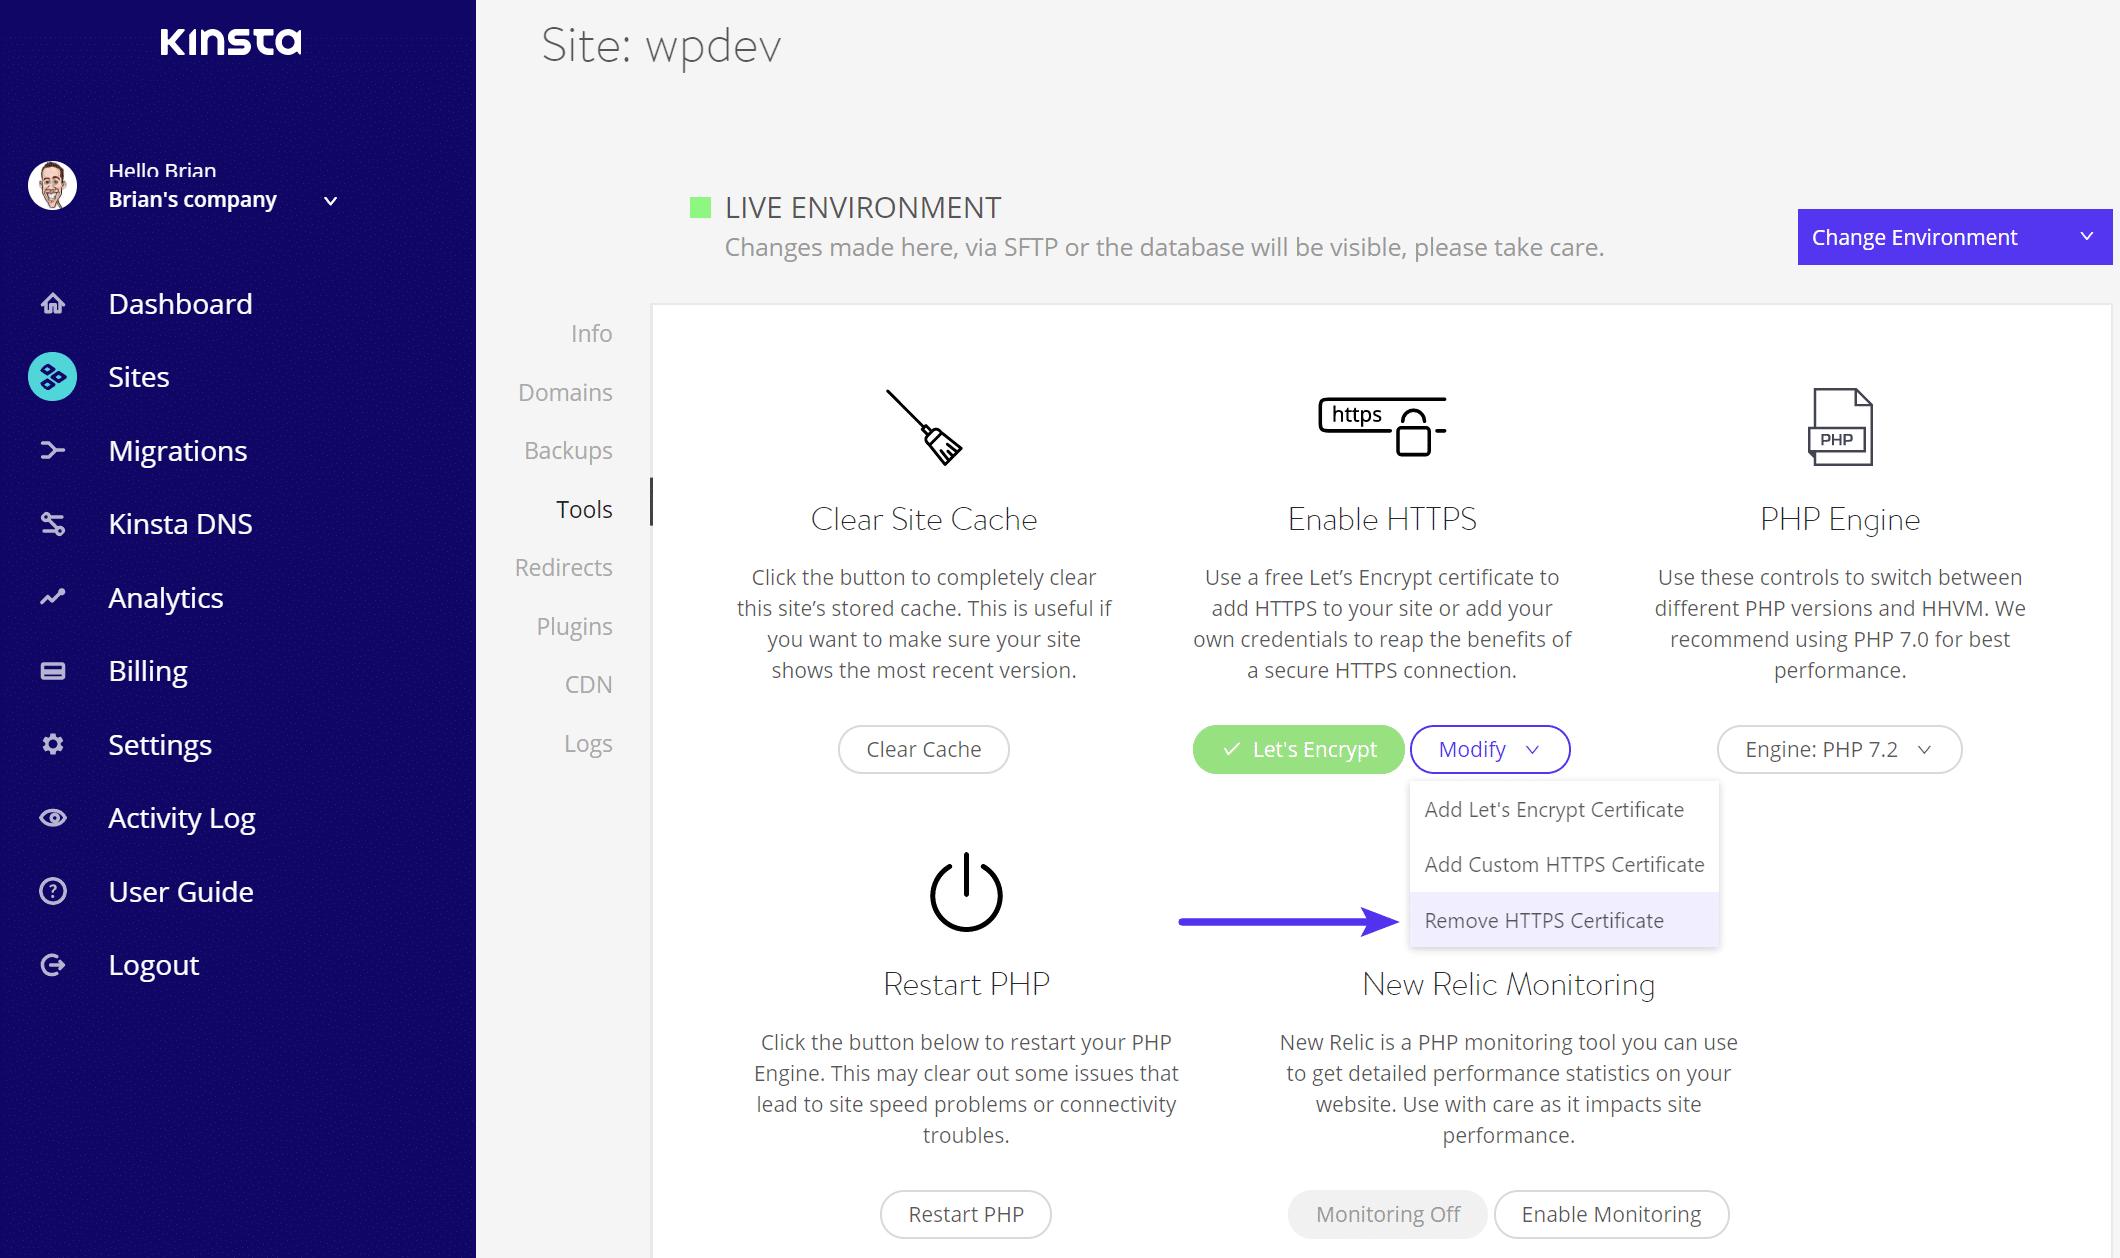 Remover certificado HTTPS